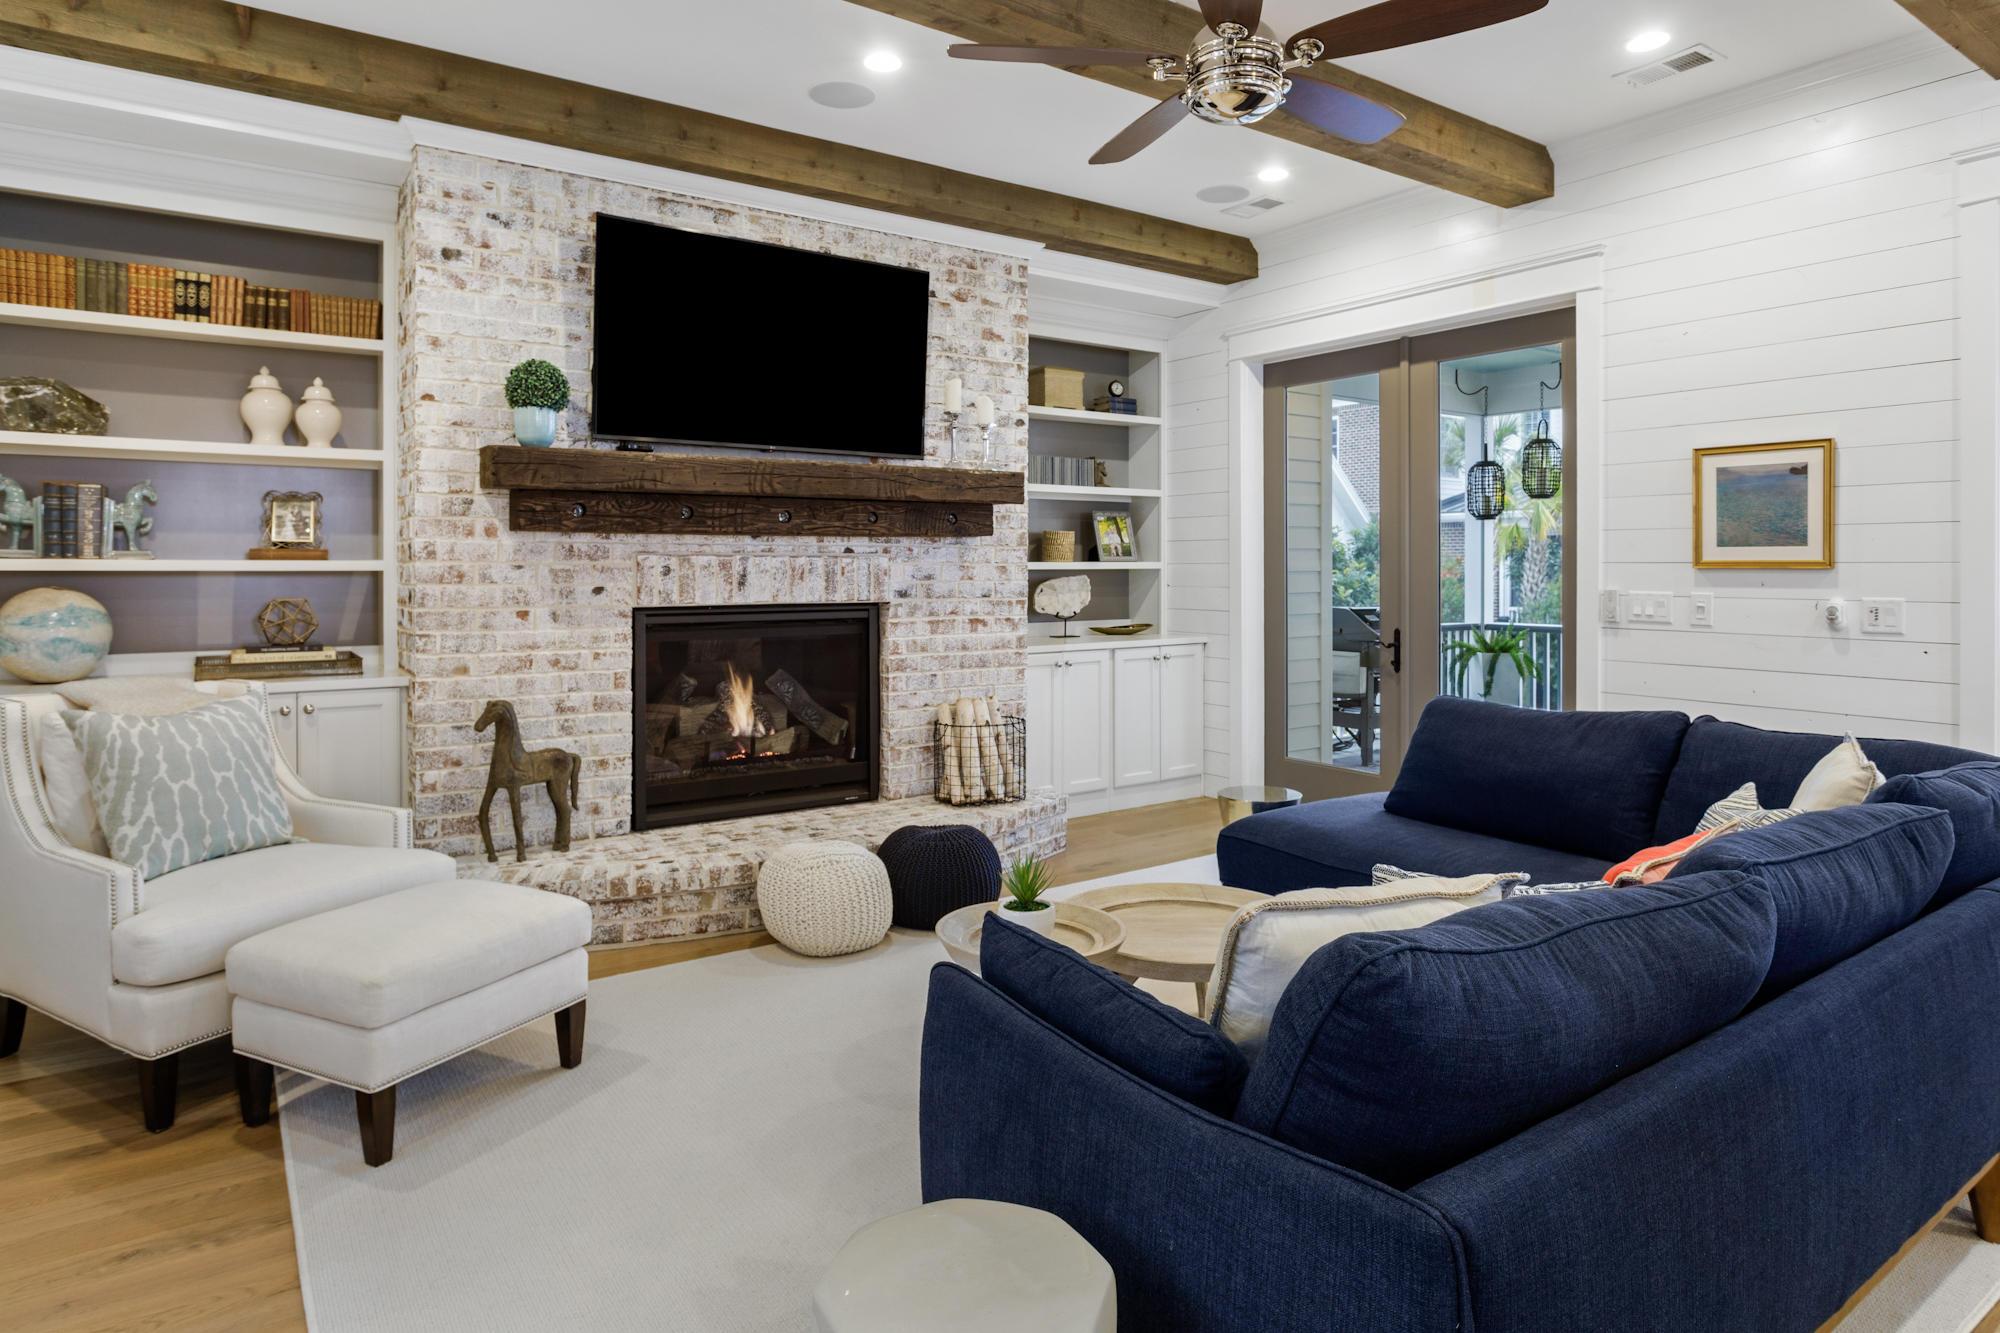 Daniel Island Park Homes For Sale - 458 Lesesne, Charleston, SC - 11